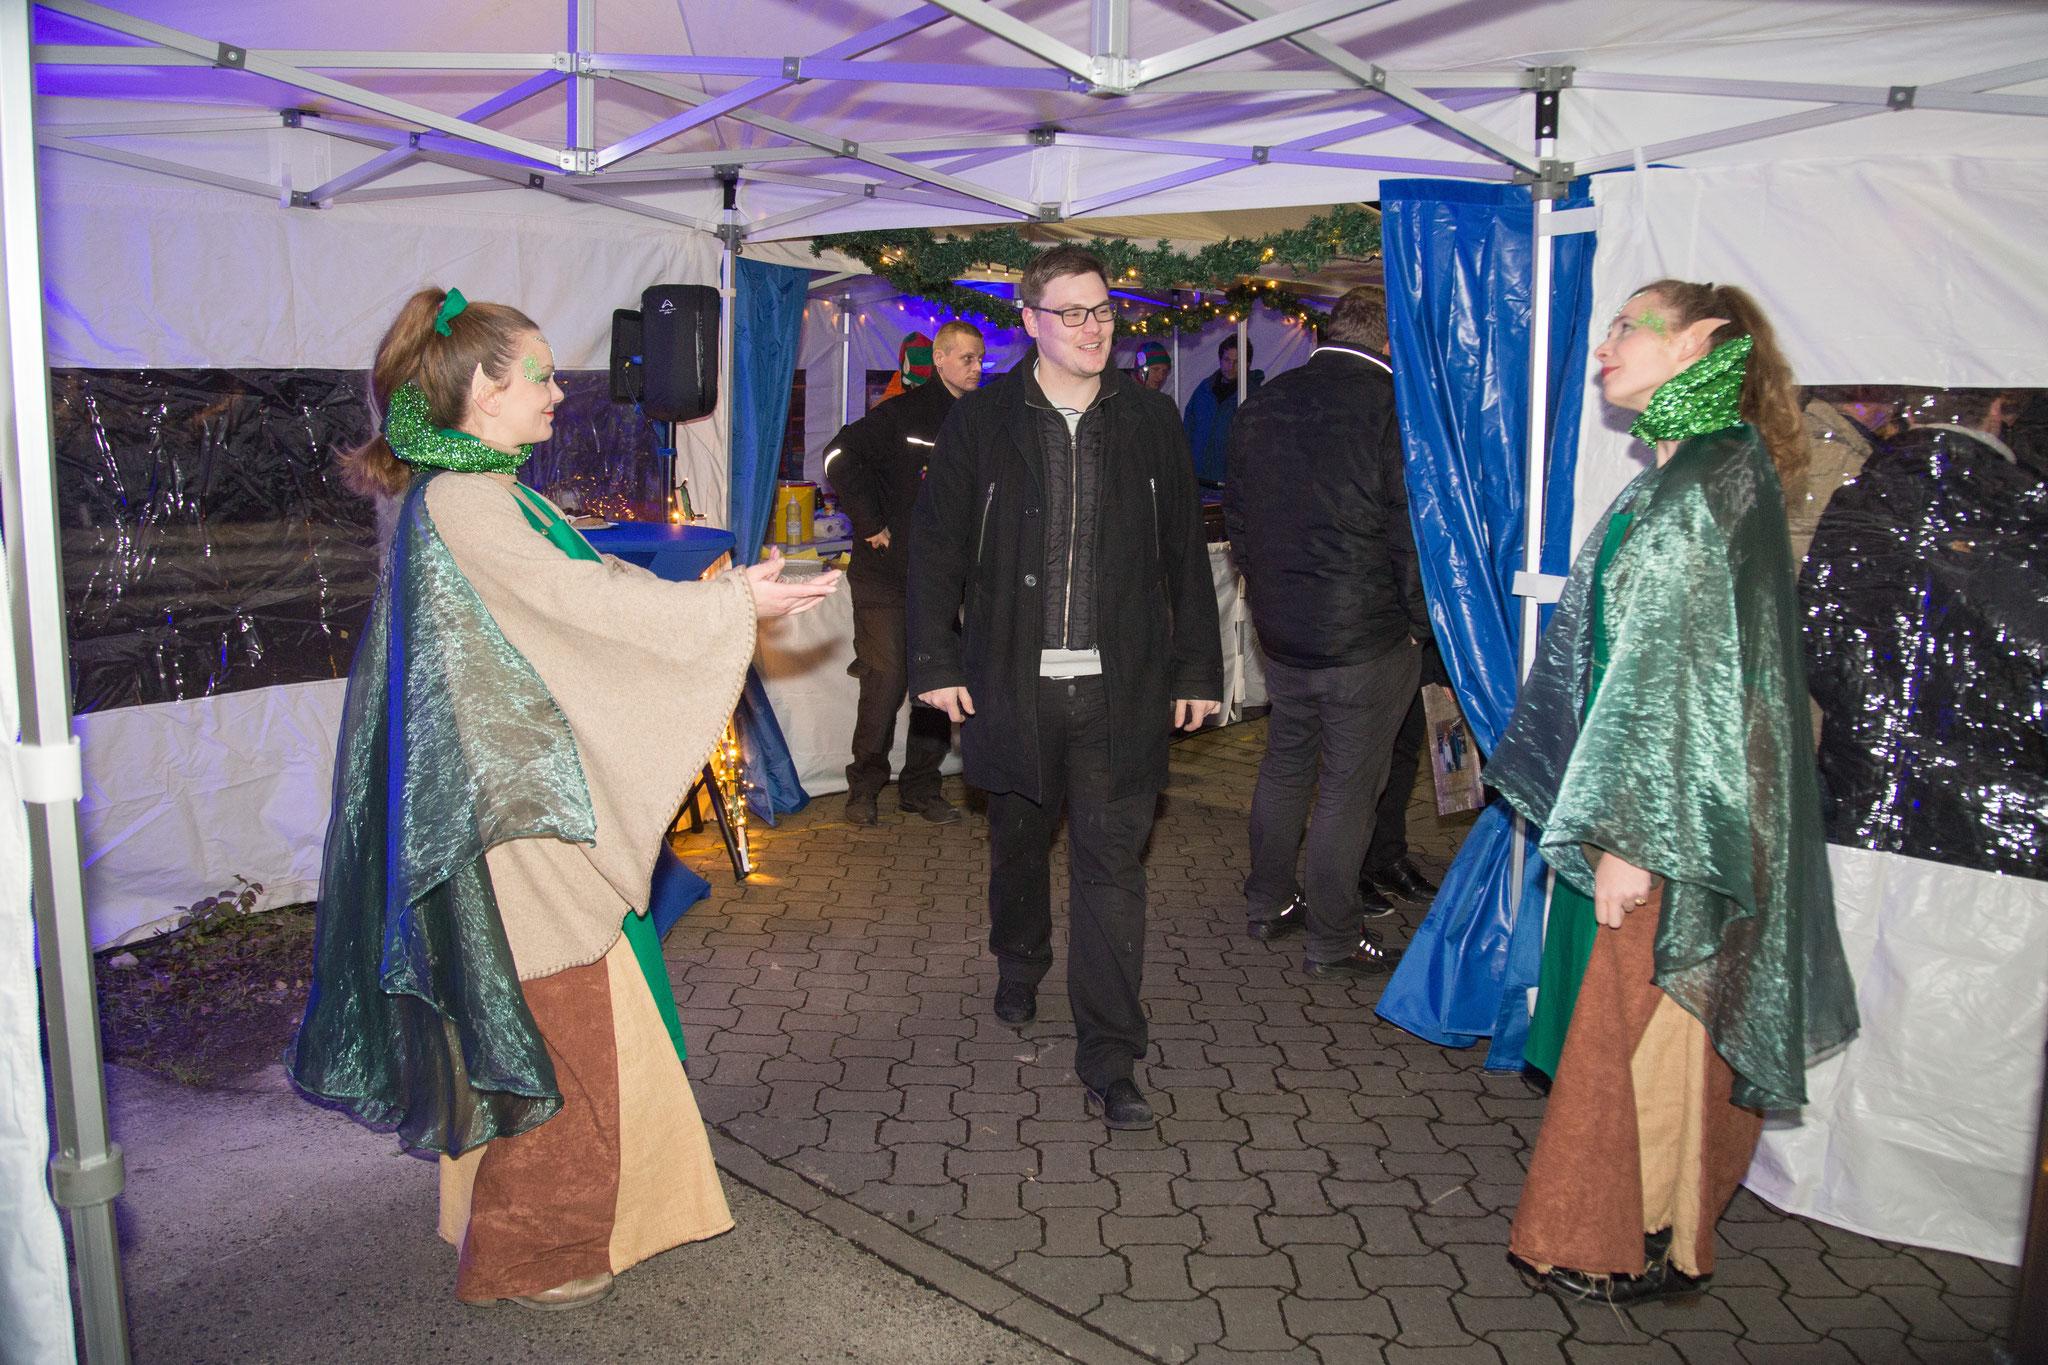 <h2> zauberhafte Elfen </h2>  begrüßen die Gäste